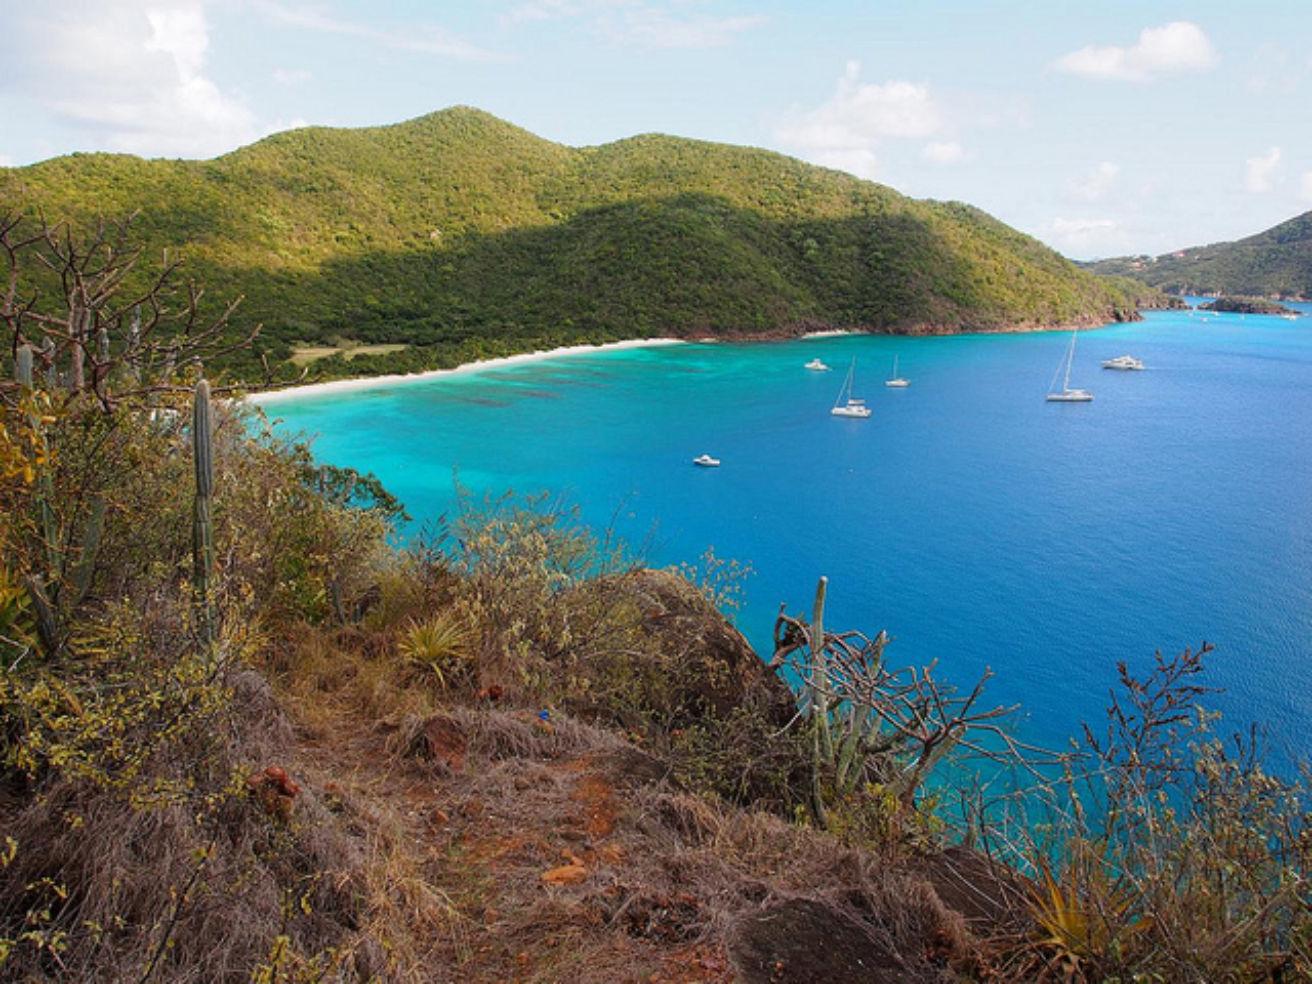 Guana Island in the British Virgin Islands